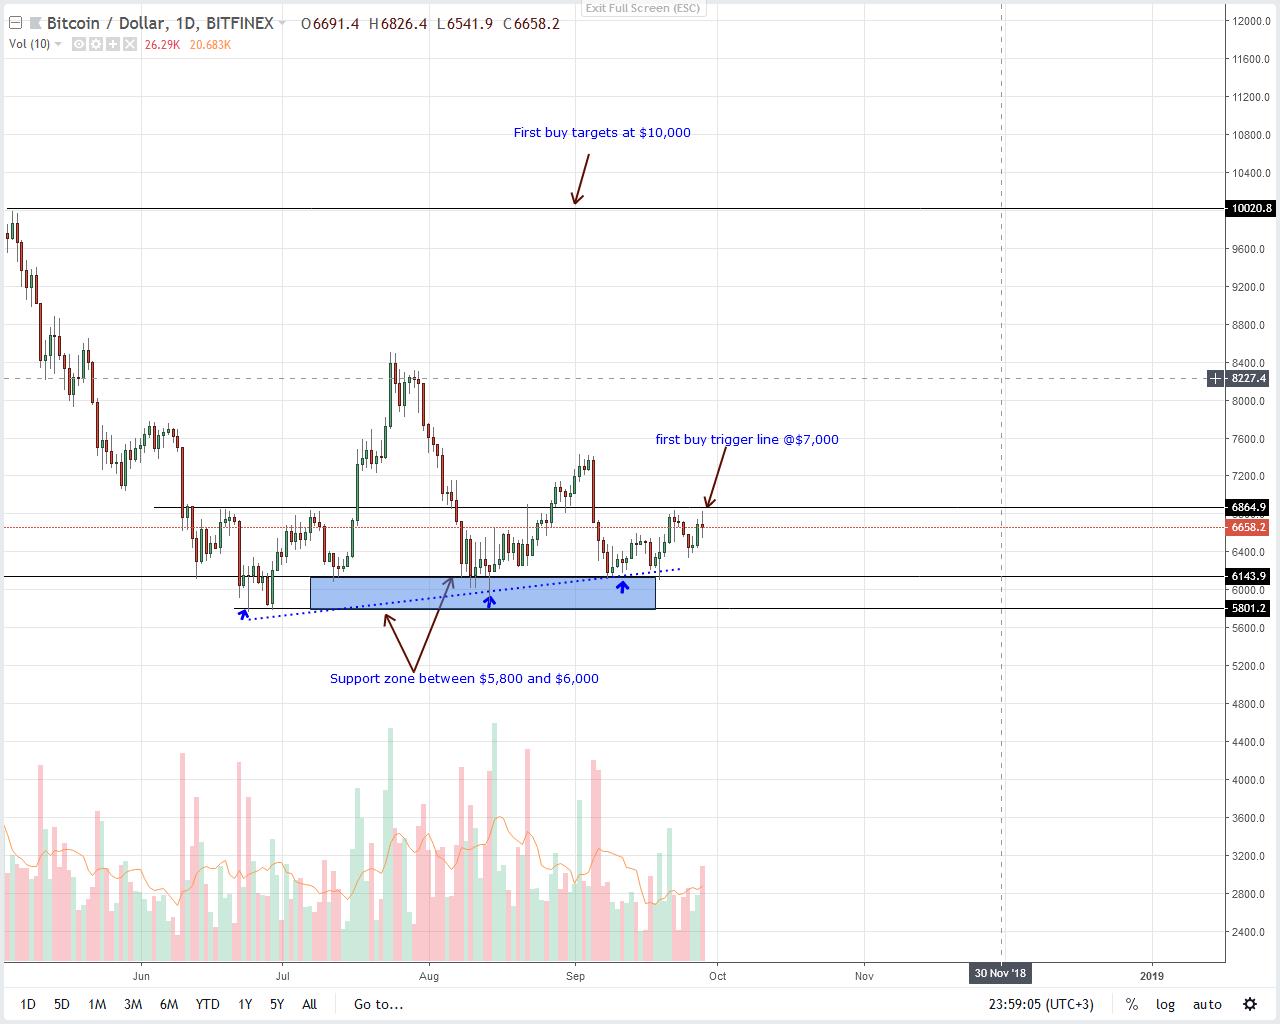 Bitcoin Price Analysis: BTC a Commodity, Not Property ...